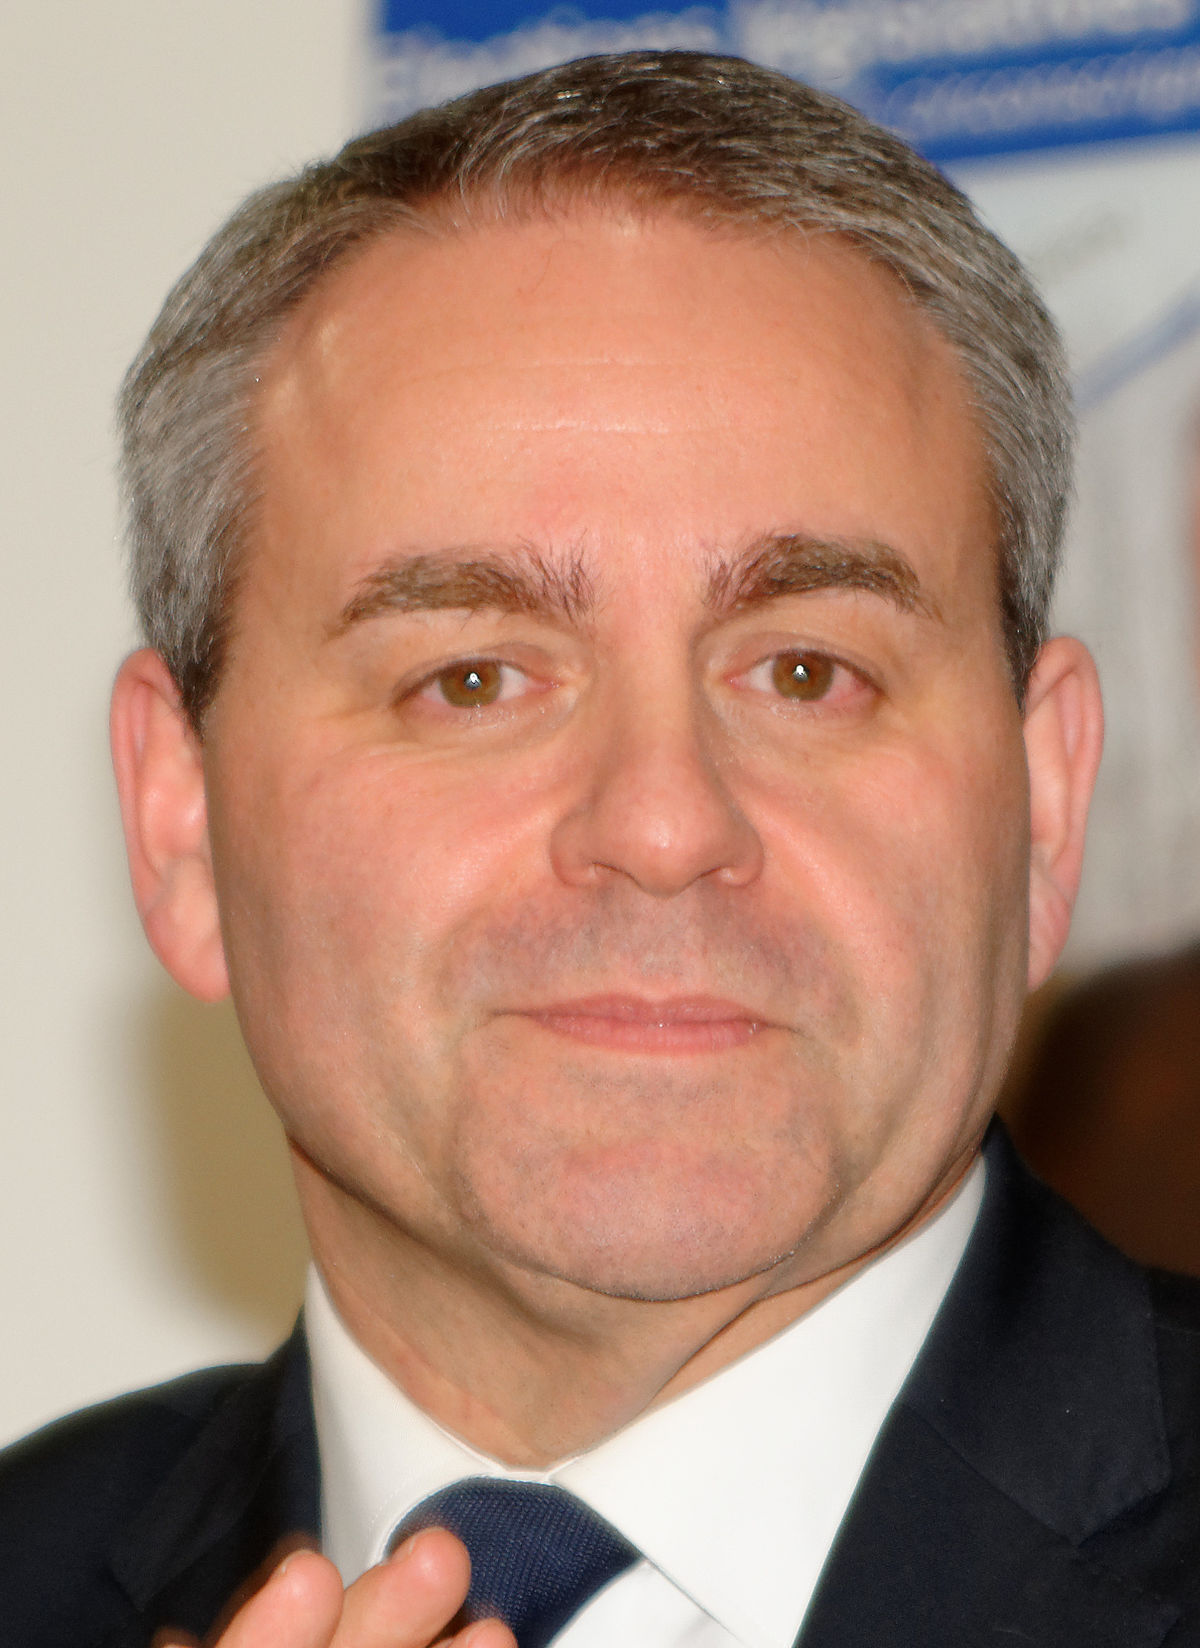 voter pour Xavier Bertrand